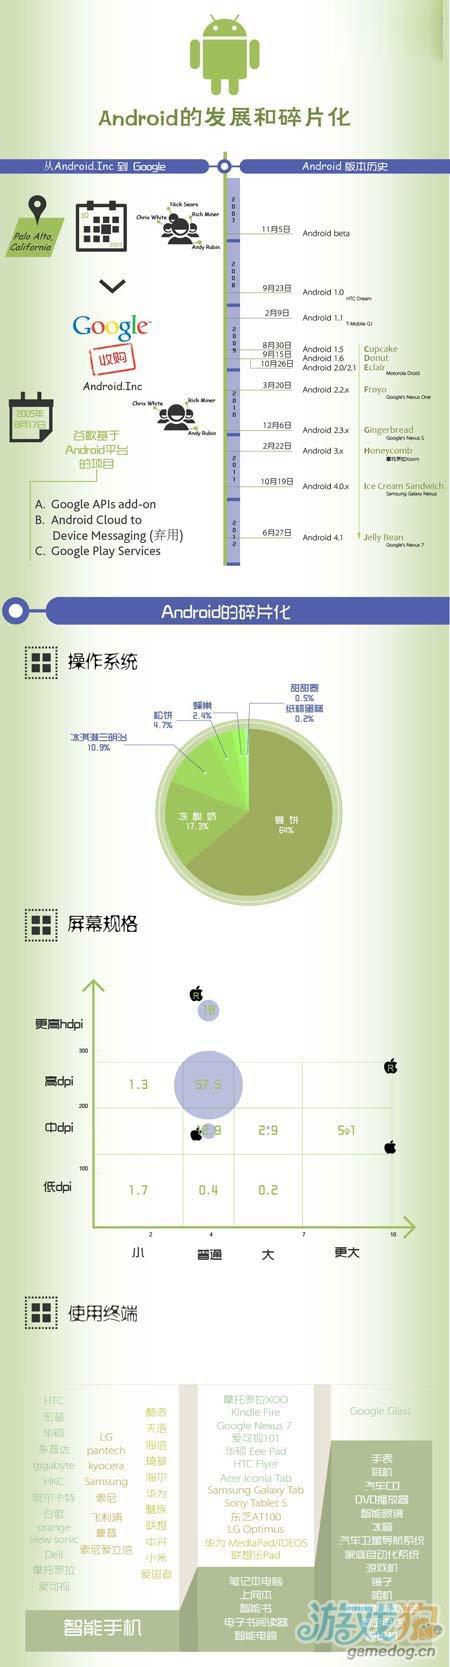 Android移动设备操作系统的各种发展和碎片化整理1